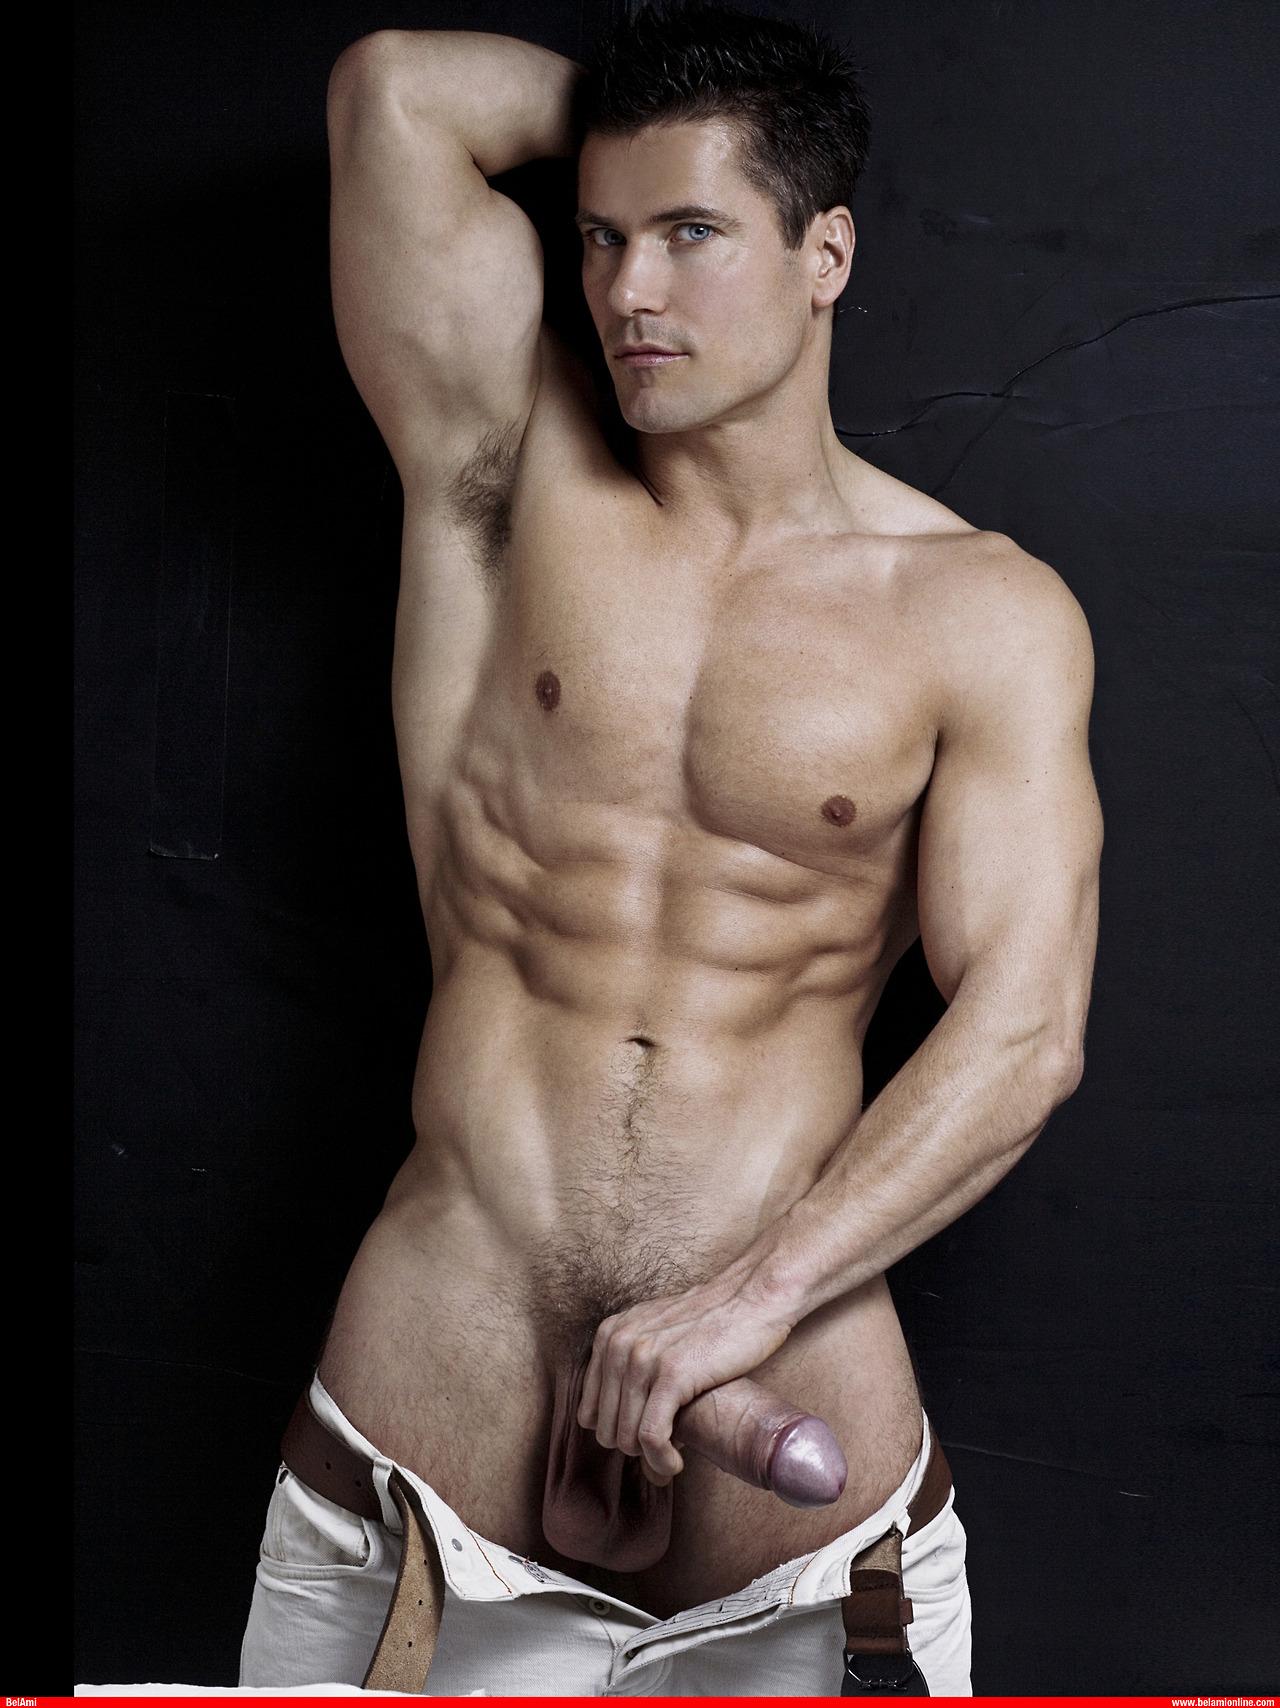 lukas ridgeston gay video